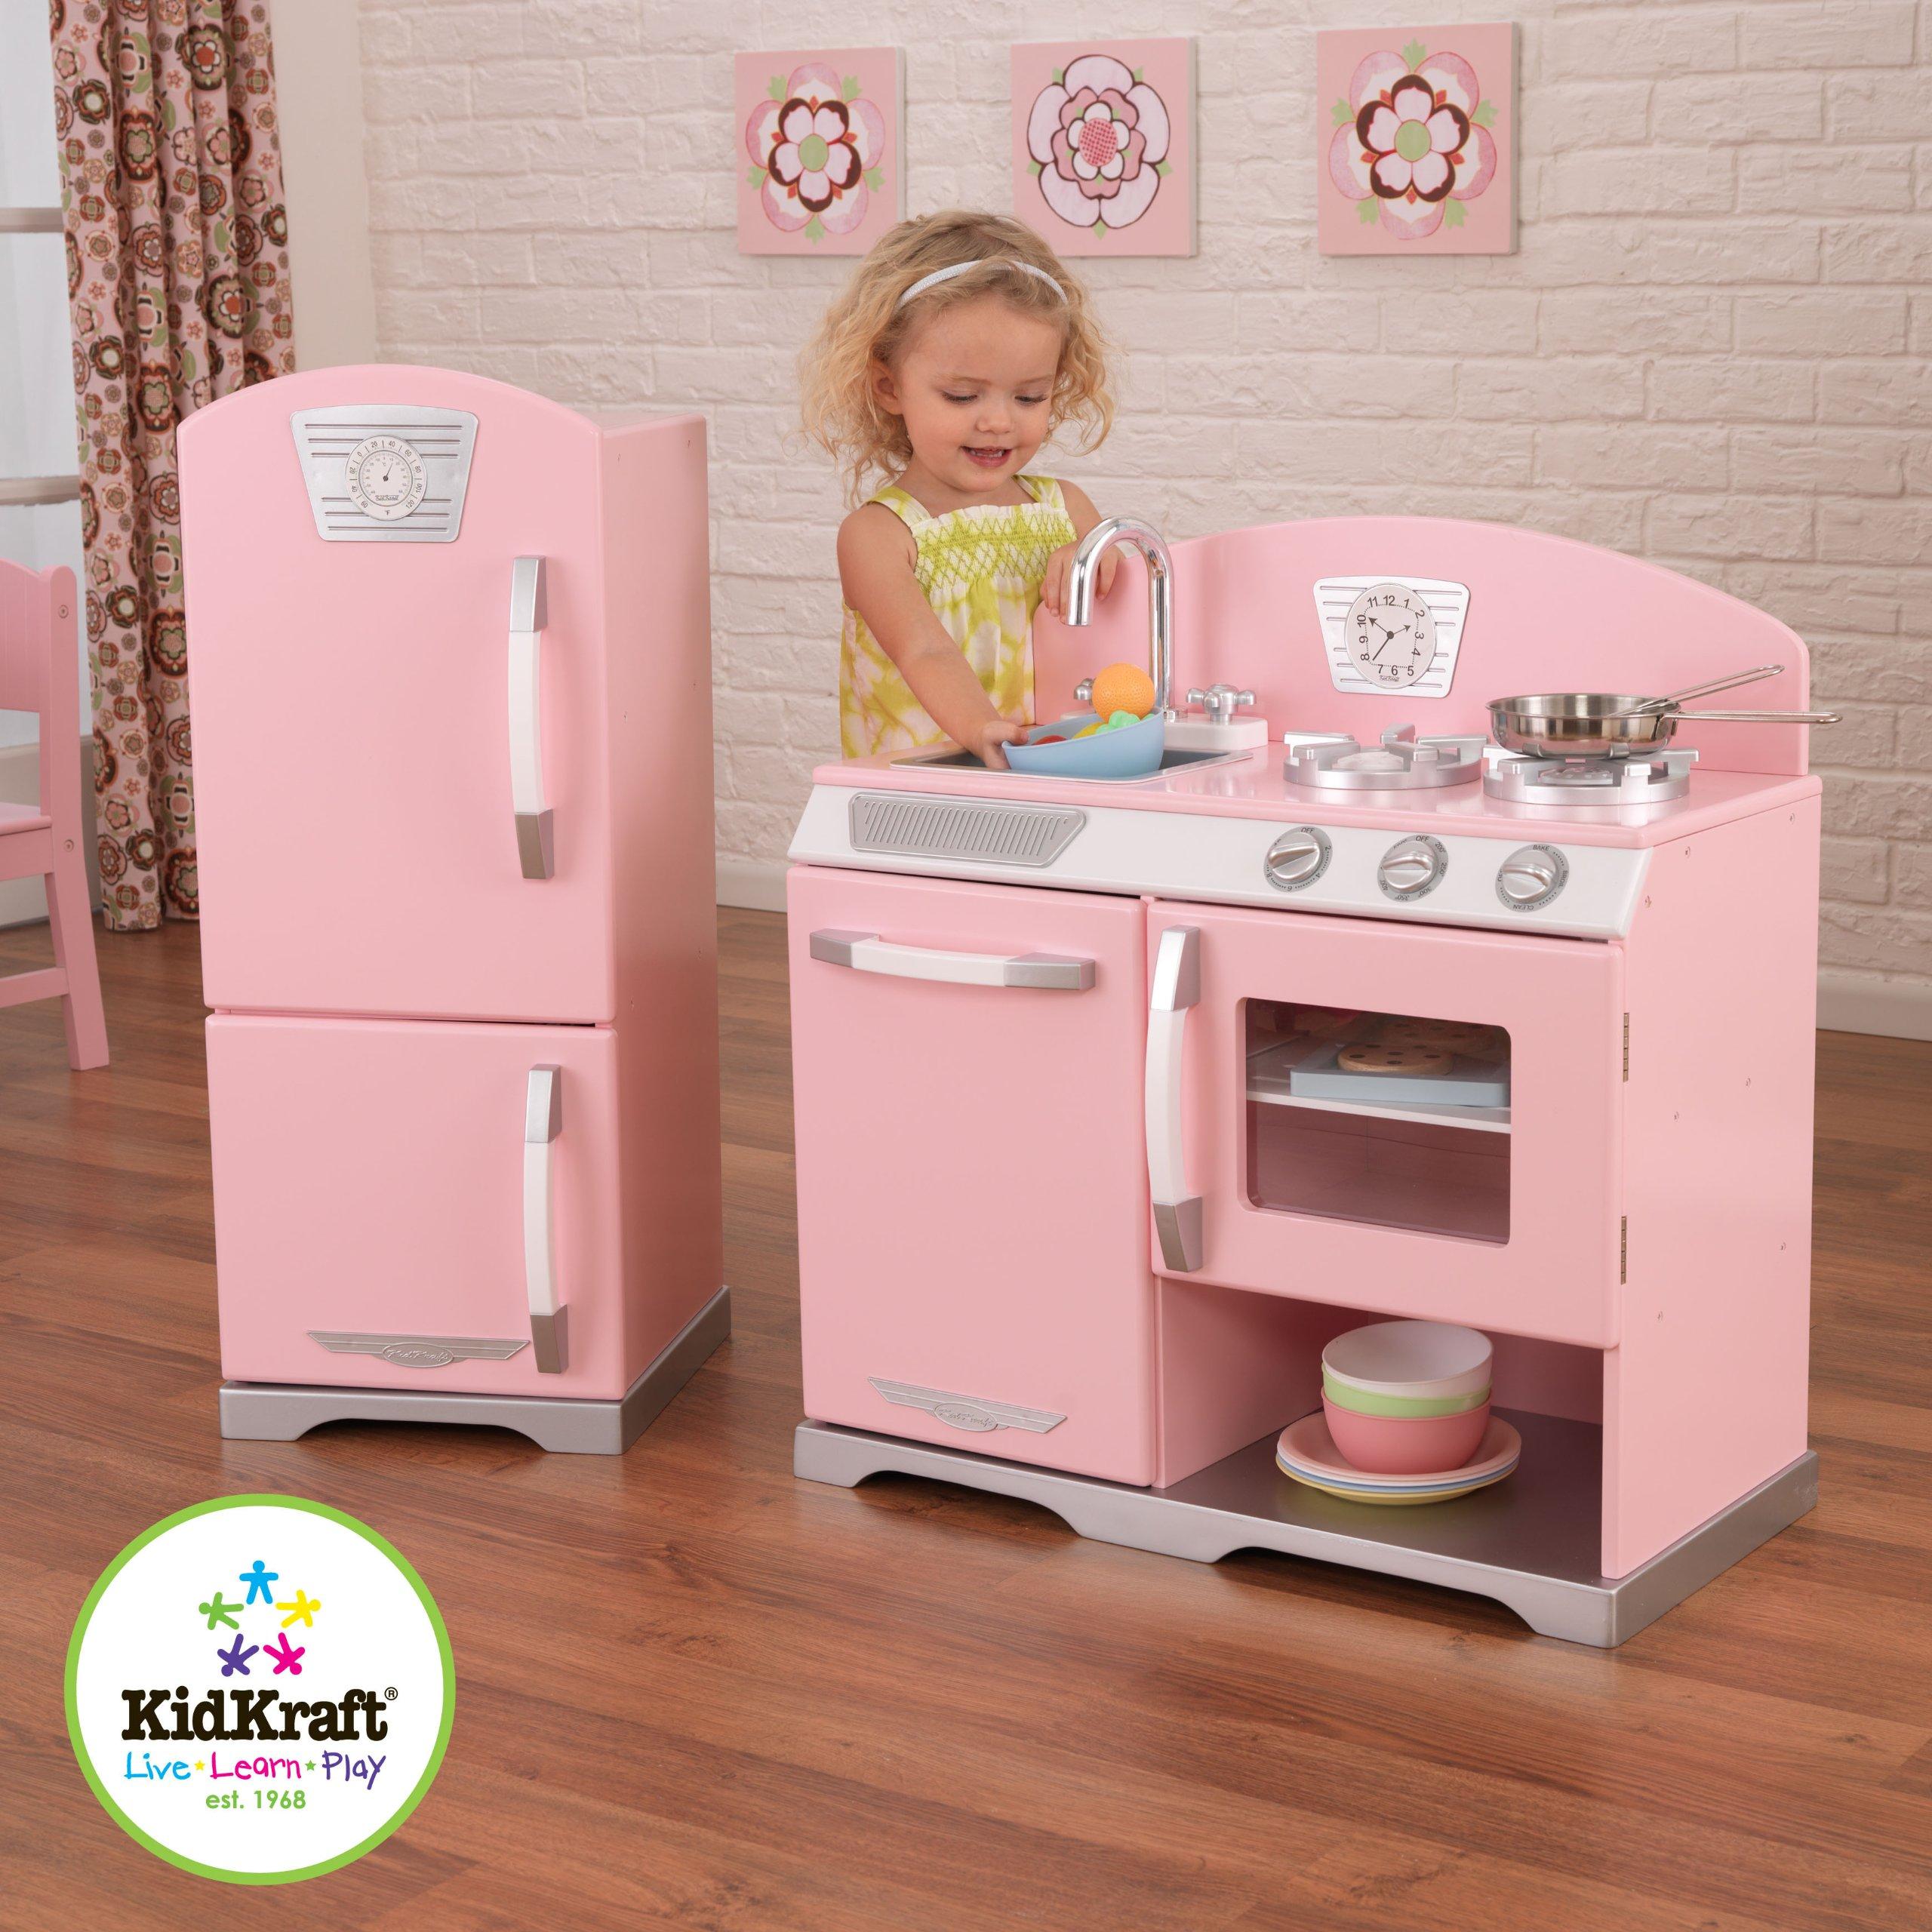 Kidkraft Retro Kitchen And Refrigerator In Pink Buy Online In